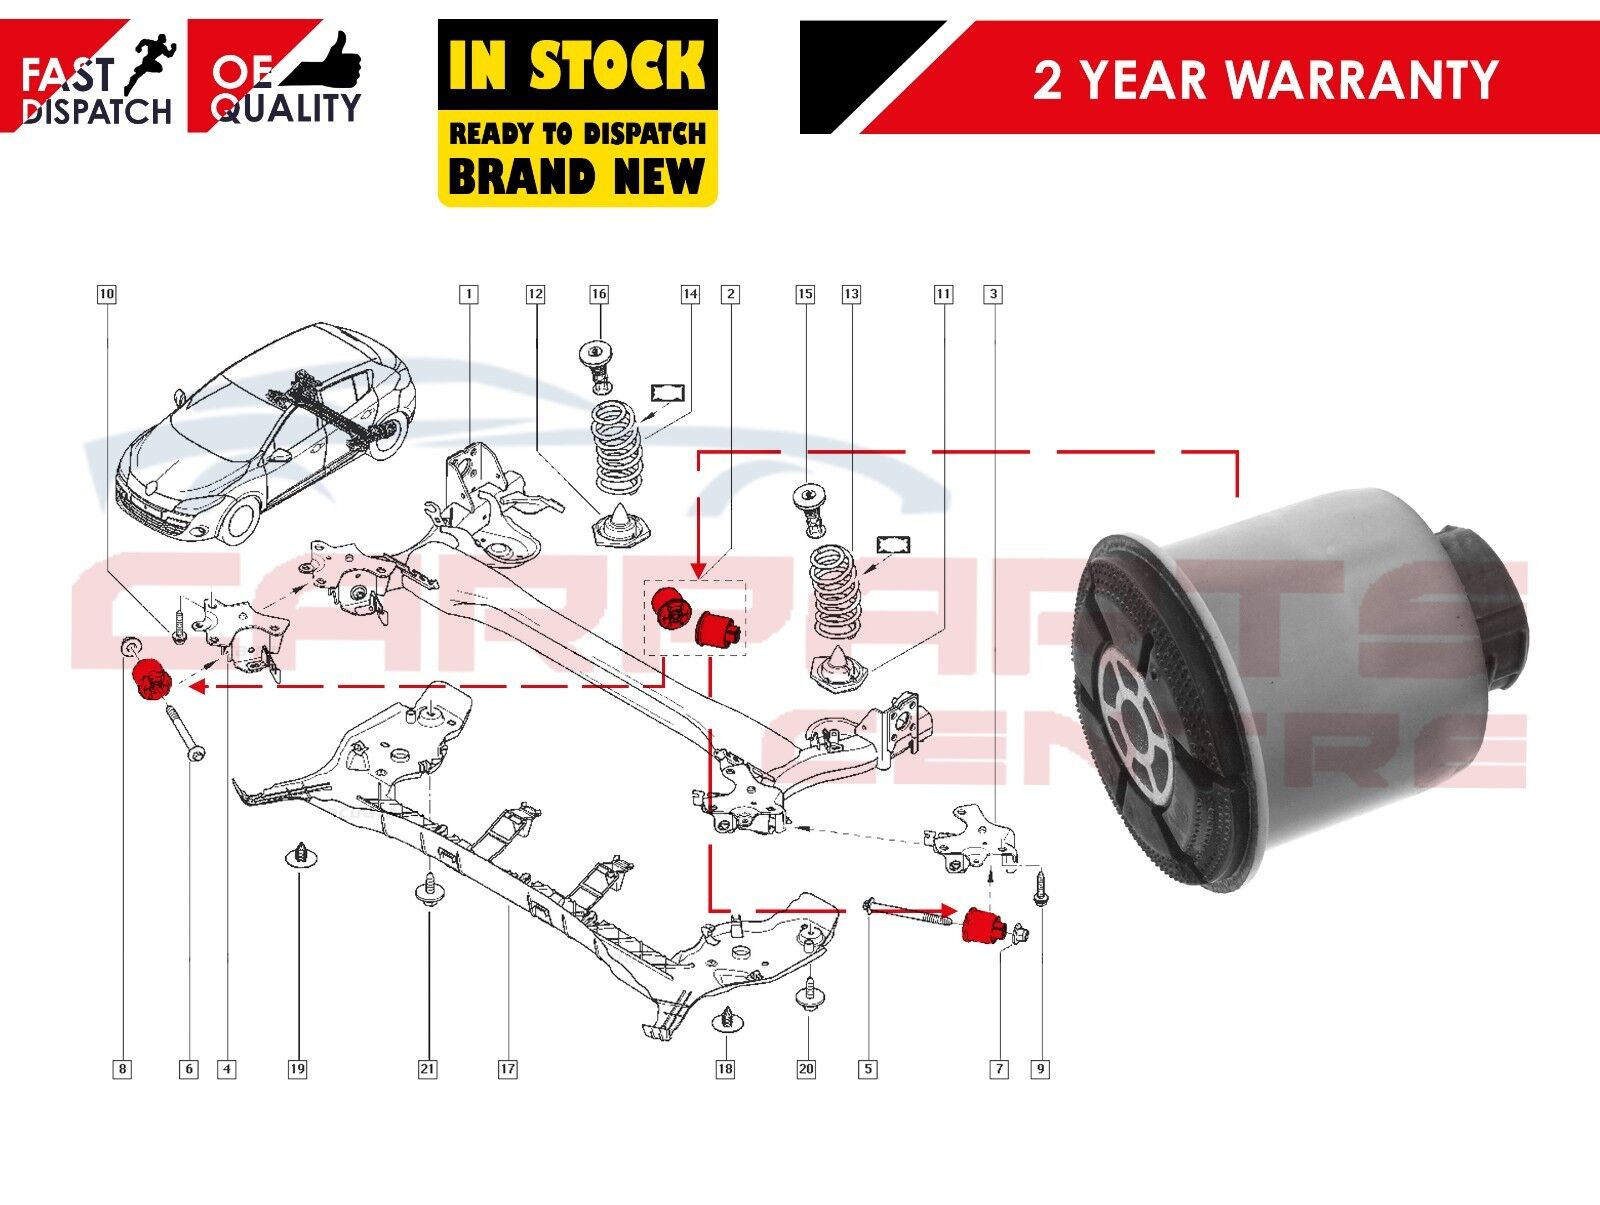 Renault Megane Scenic mk2 2 II REAR AXLE SUBFRAME BUSH HEAVY DUTY REPAIR TOOL